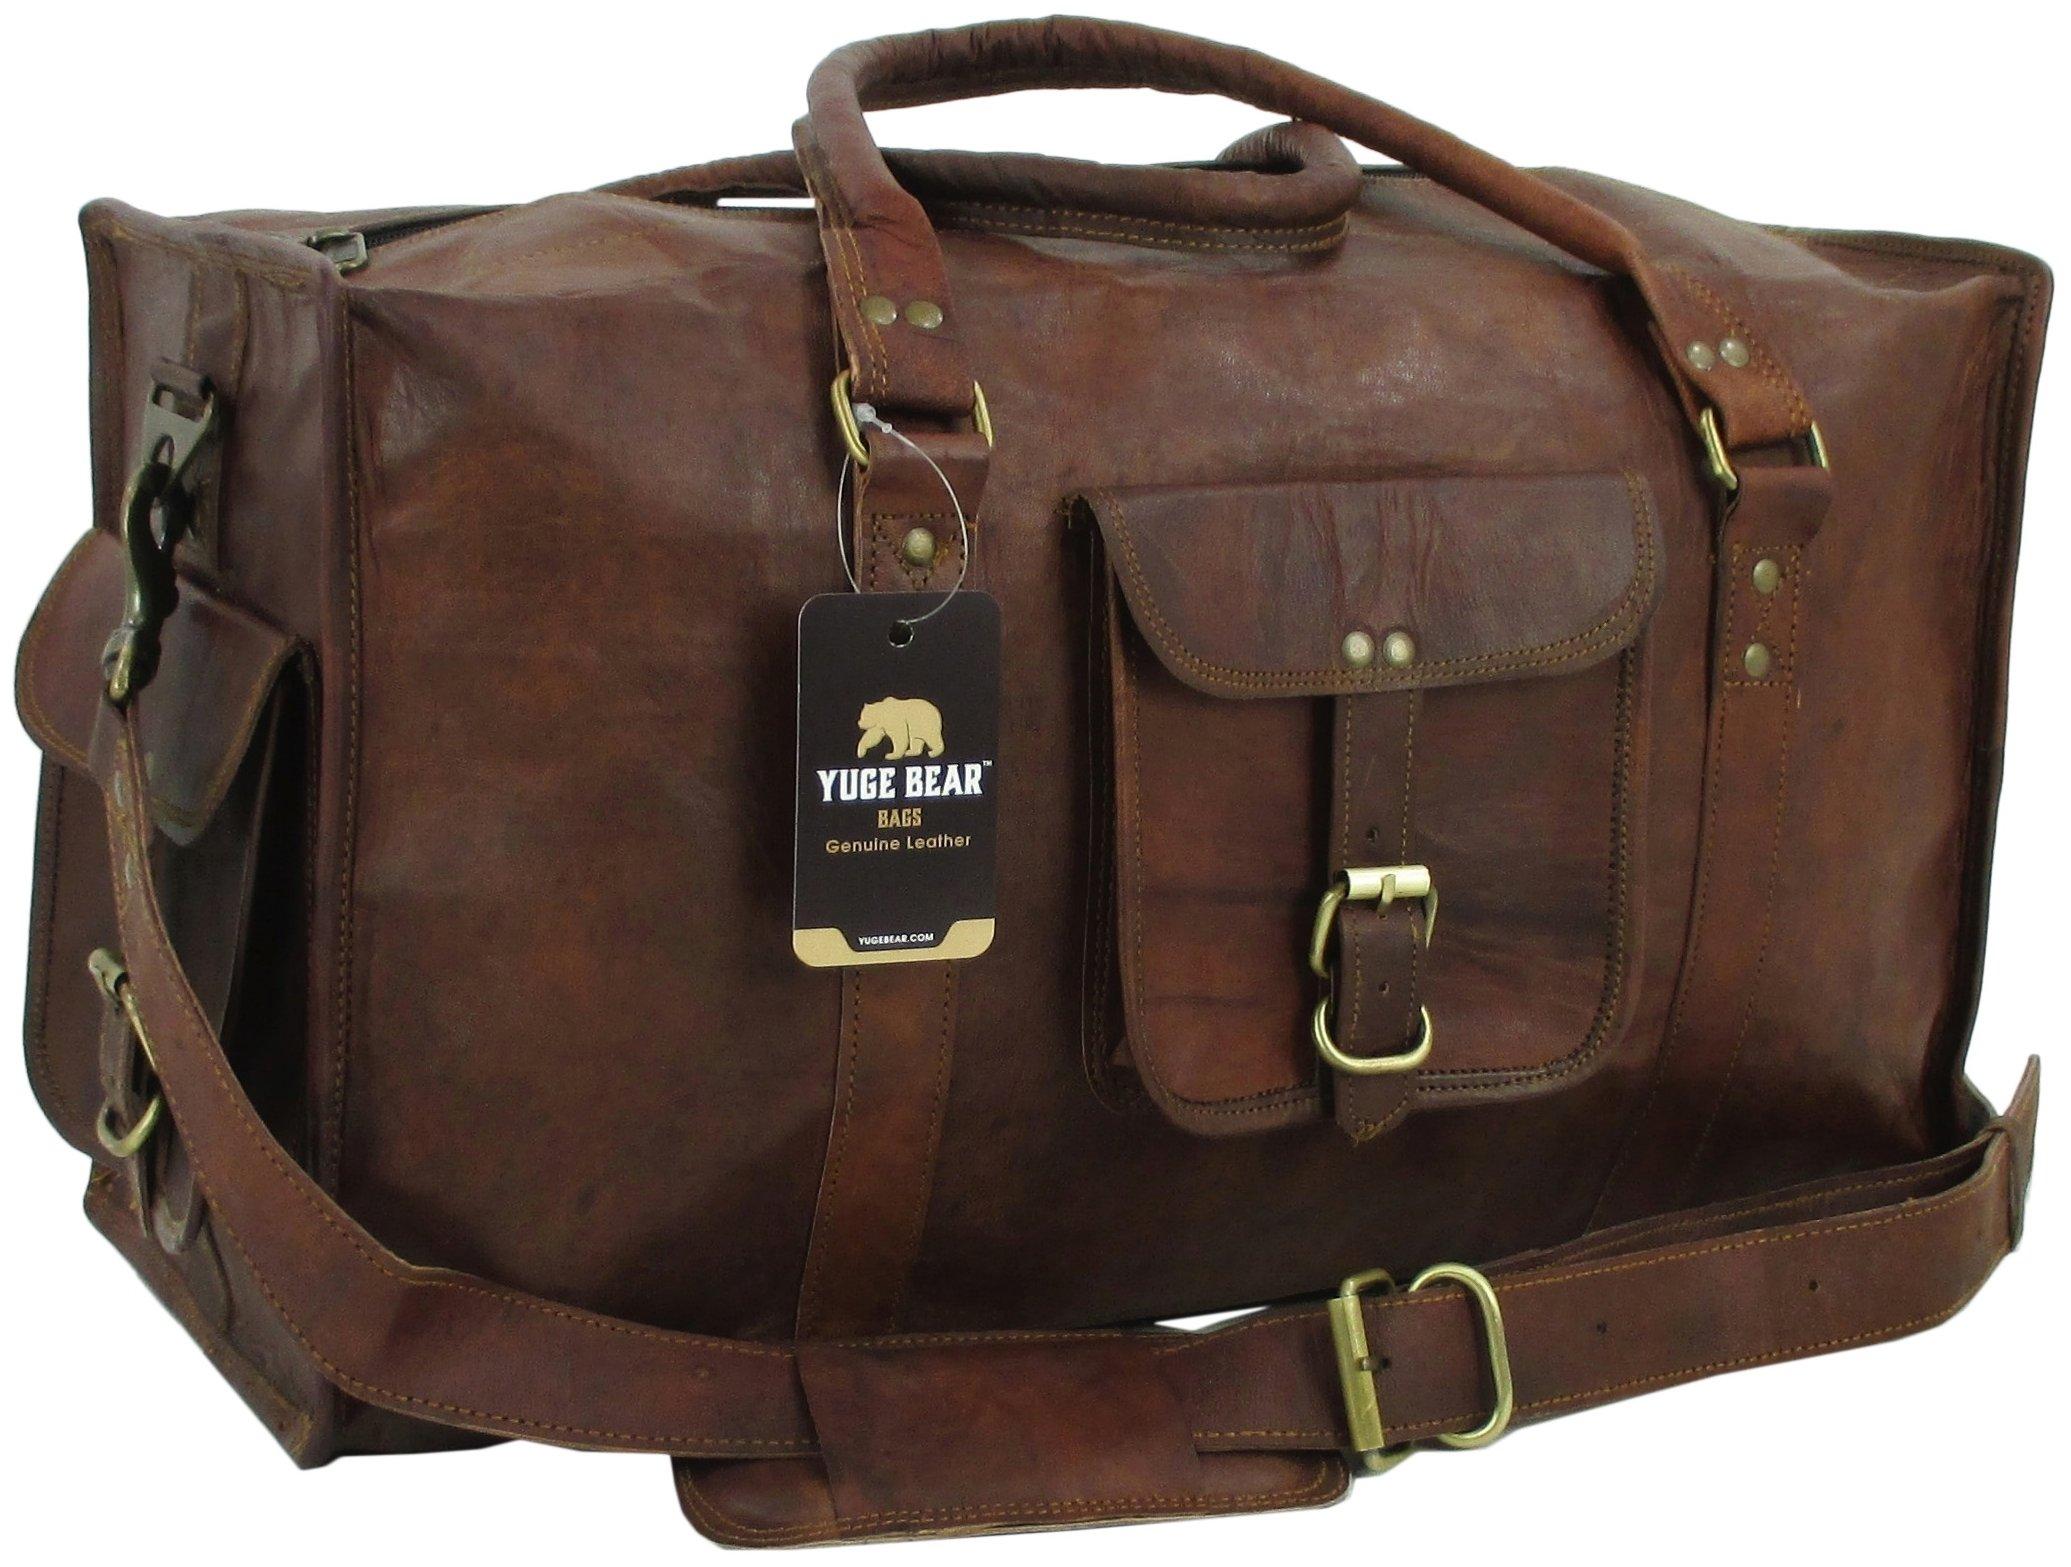 Yuge Bear 21'' DS1 Vintage Leather Carry On Travel Weekender Duffel Bag